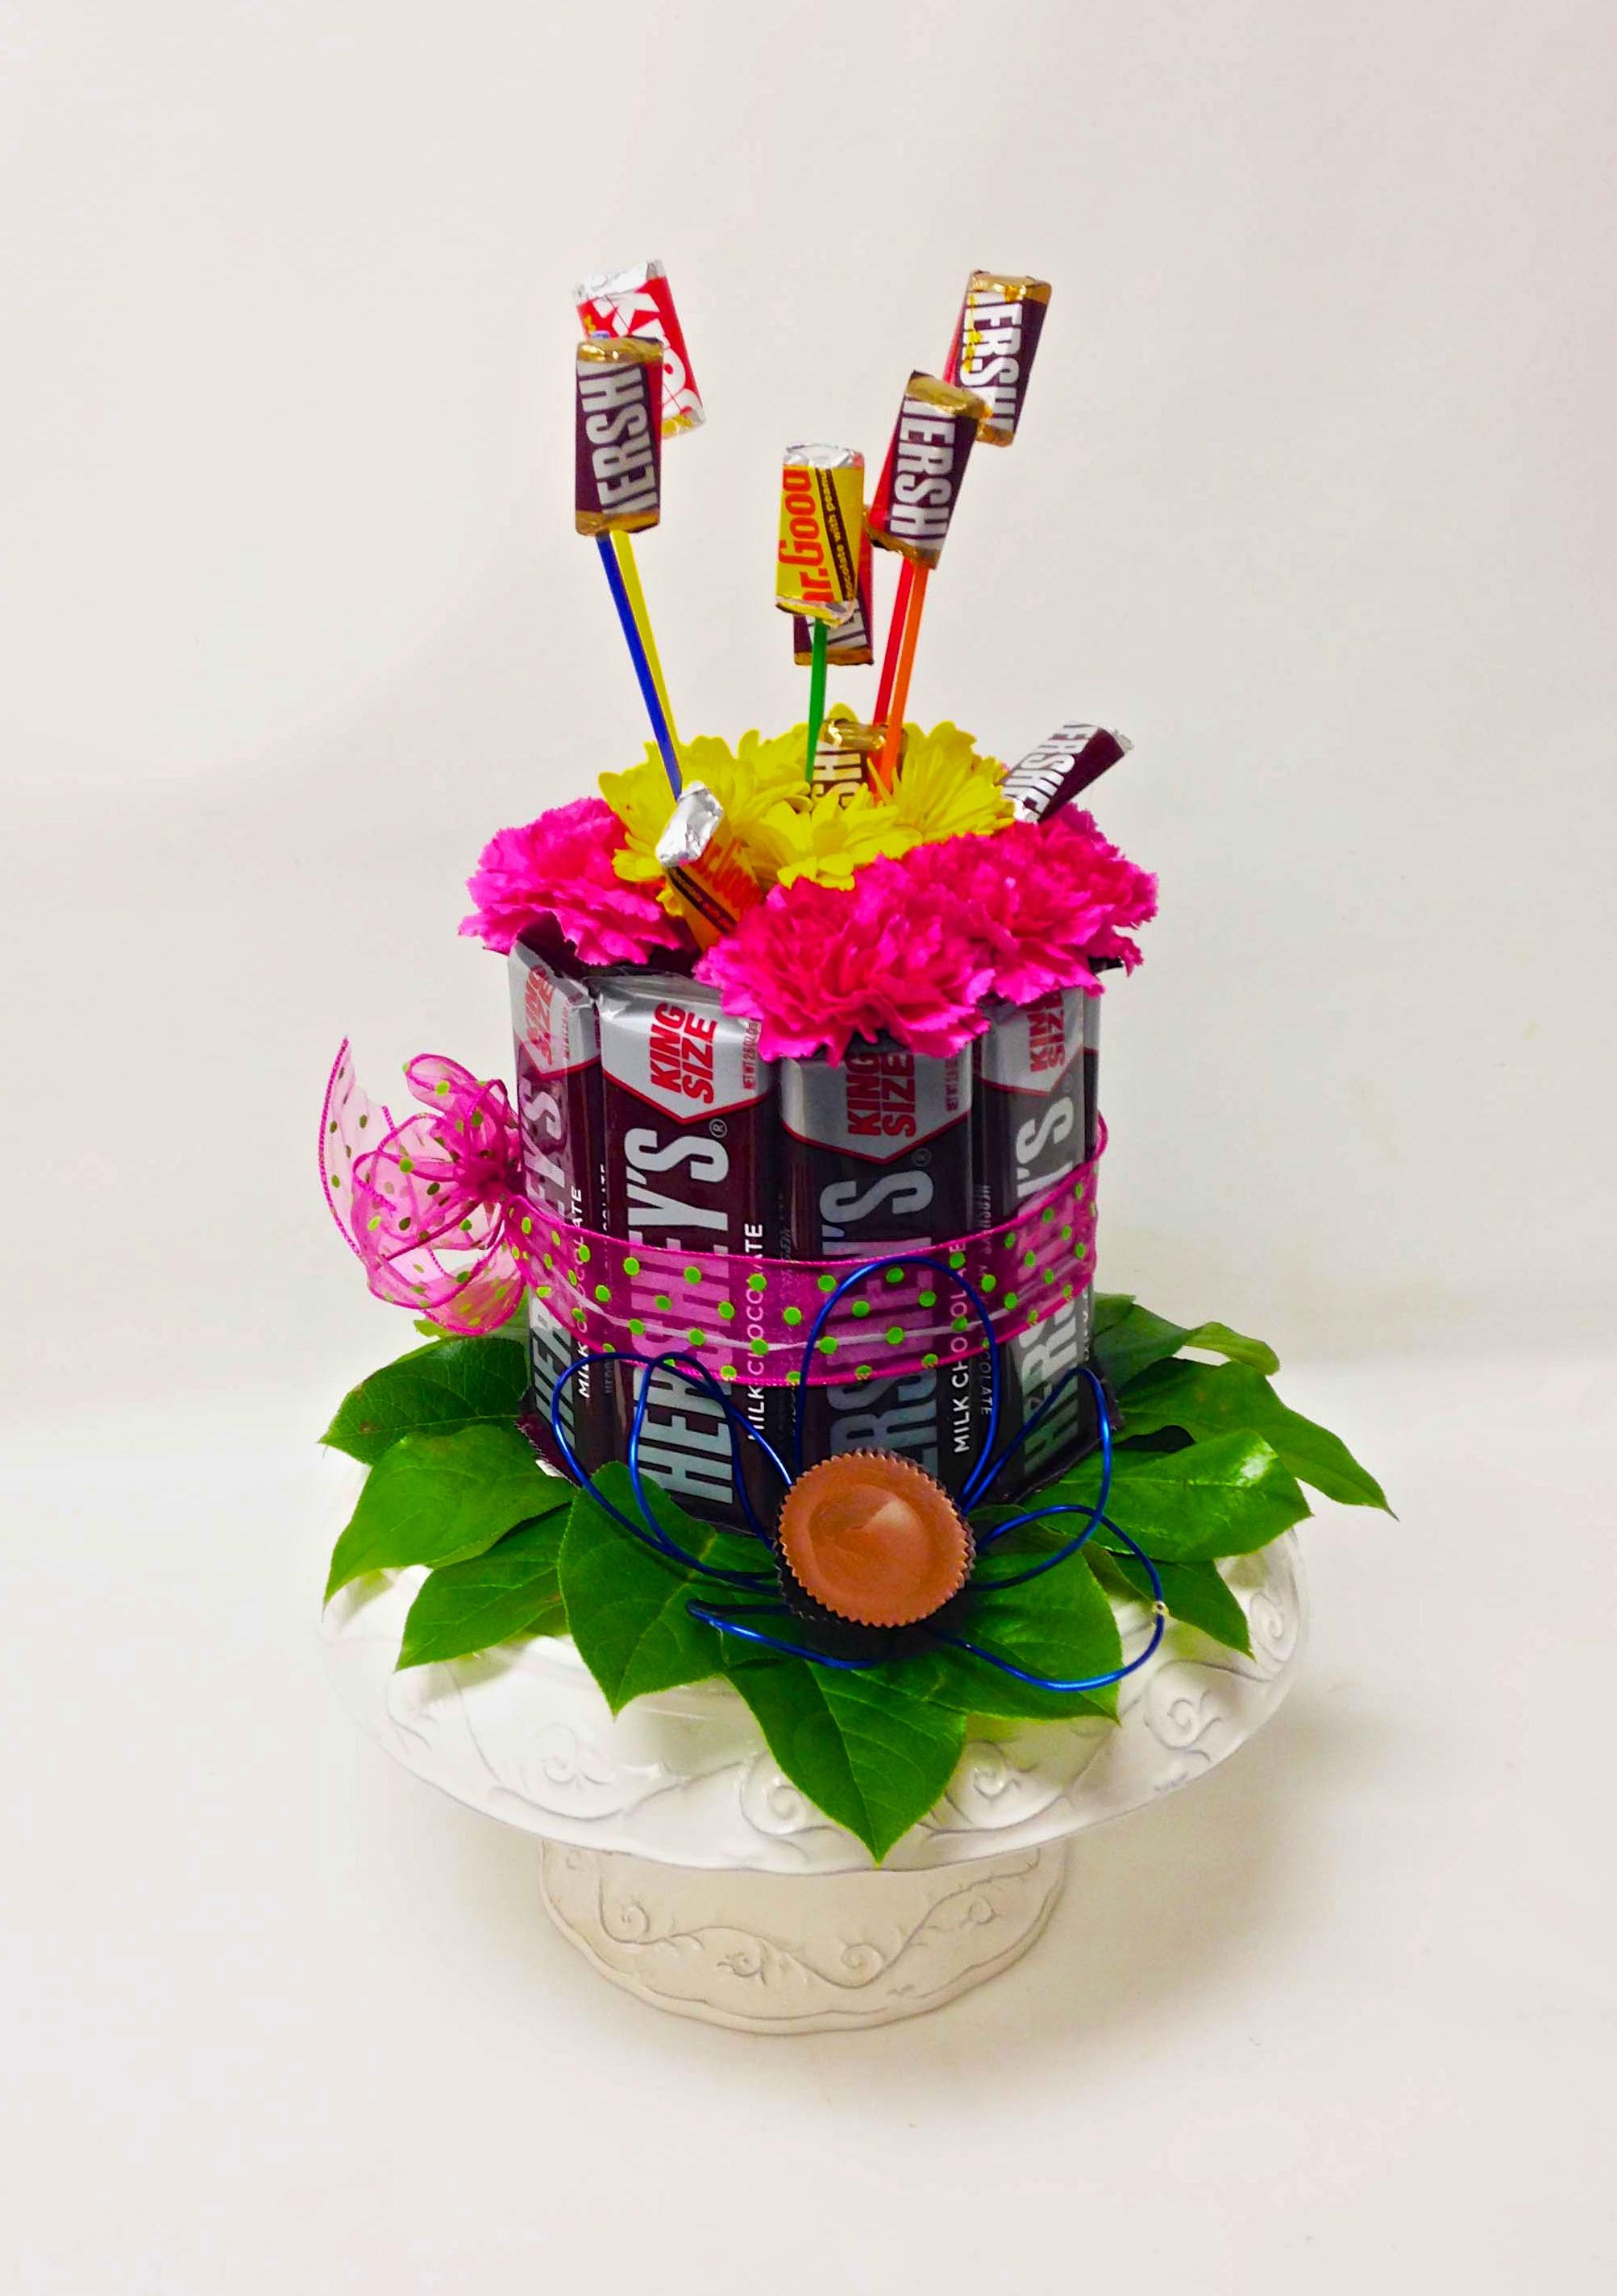 Hershey Cake Florals